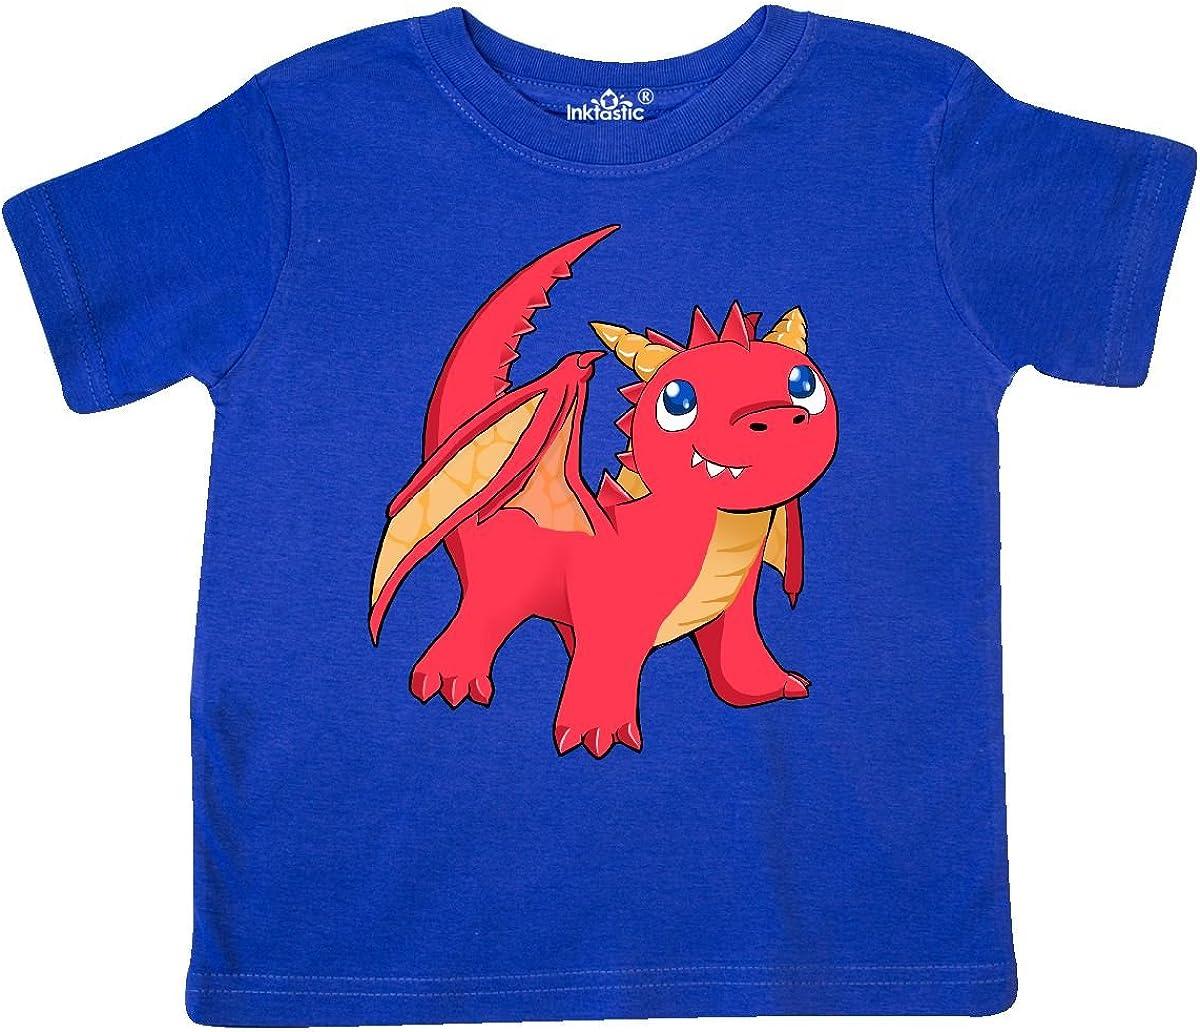 So Relative Unisex Baby I Get My Good Looks From My Nana T-Shirt Romper